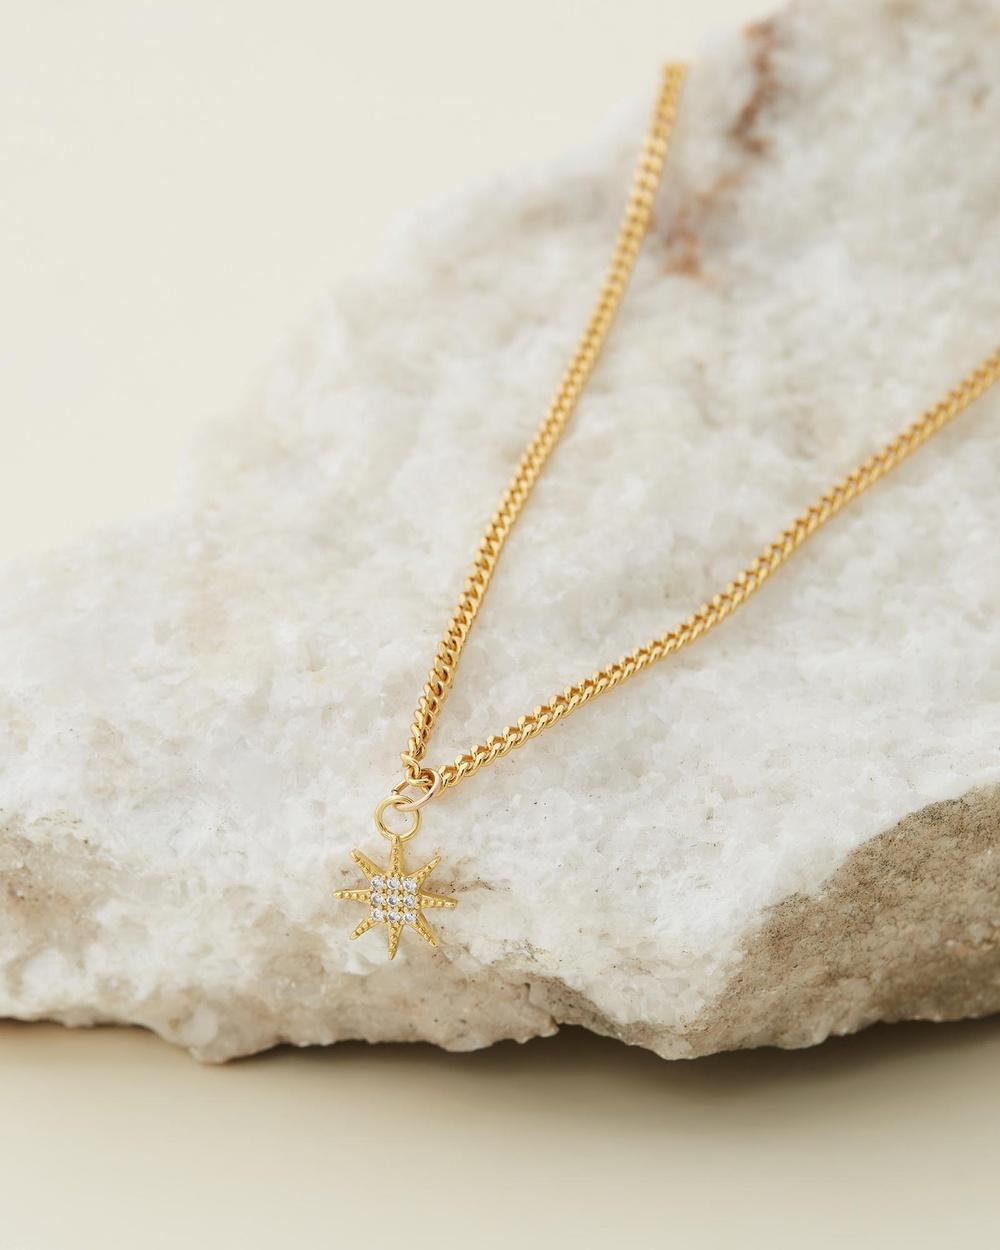 Avant Studio Stella Necklace Jewellery Gold